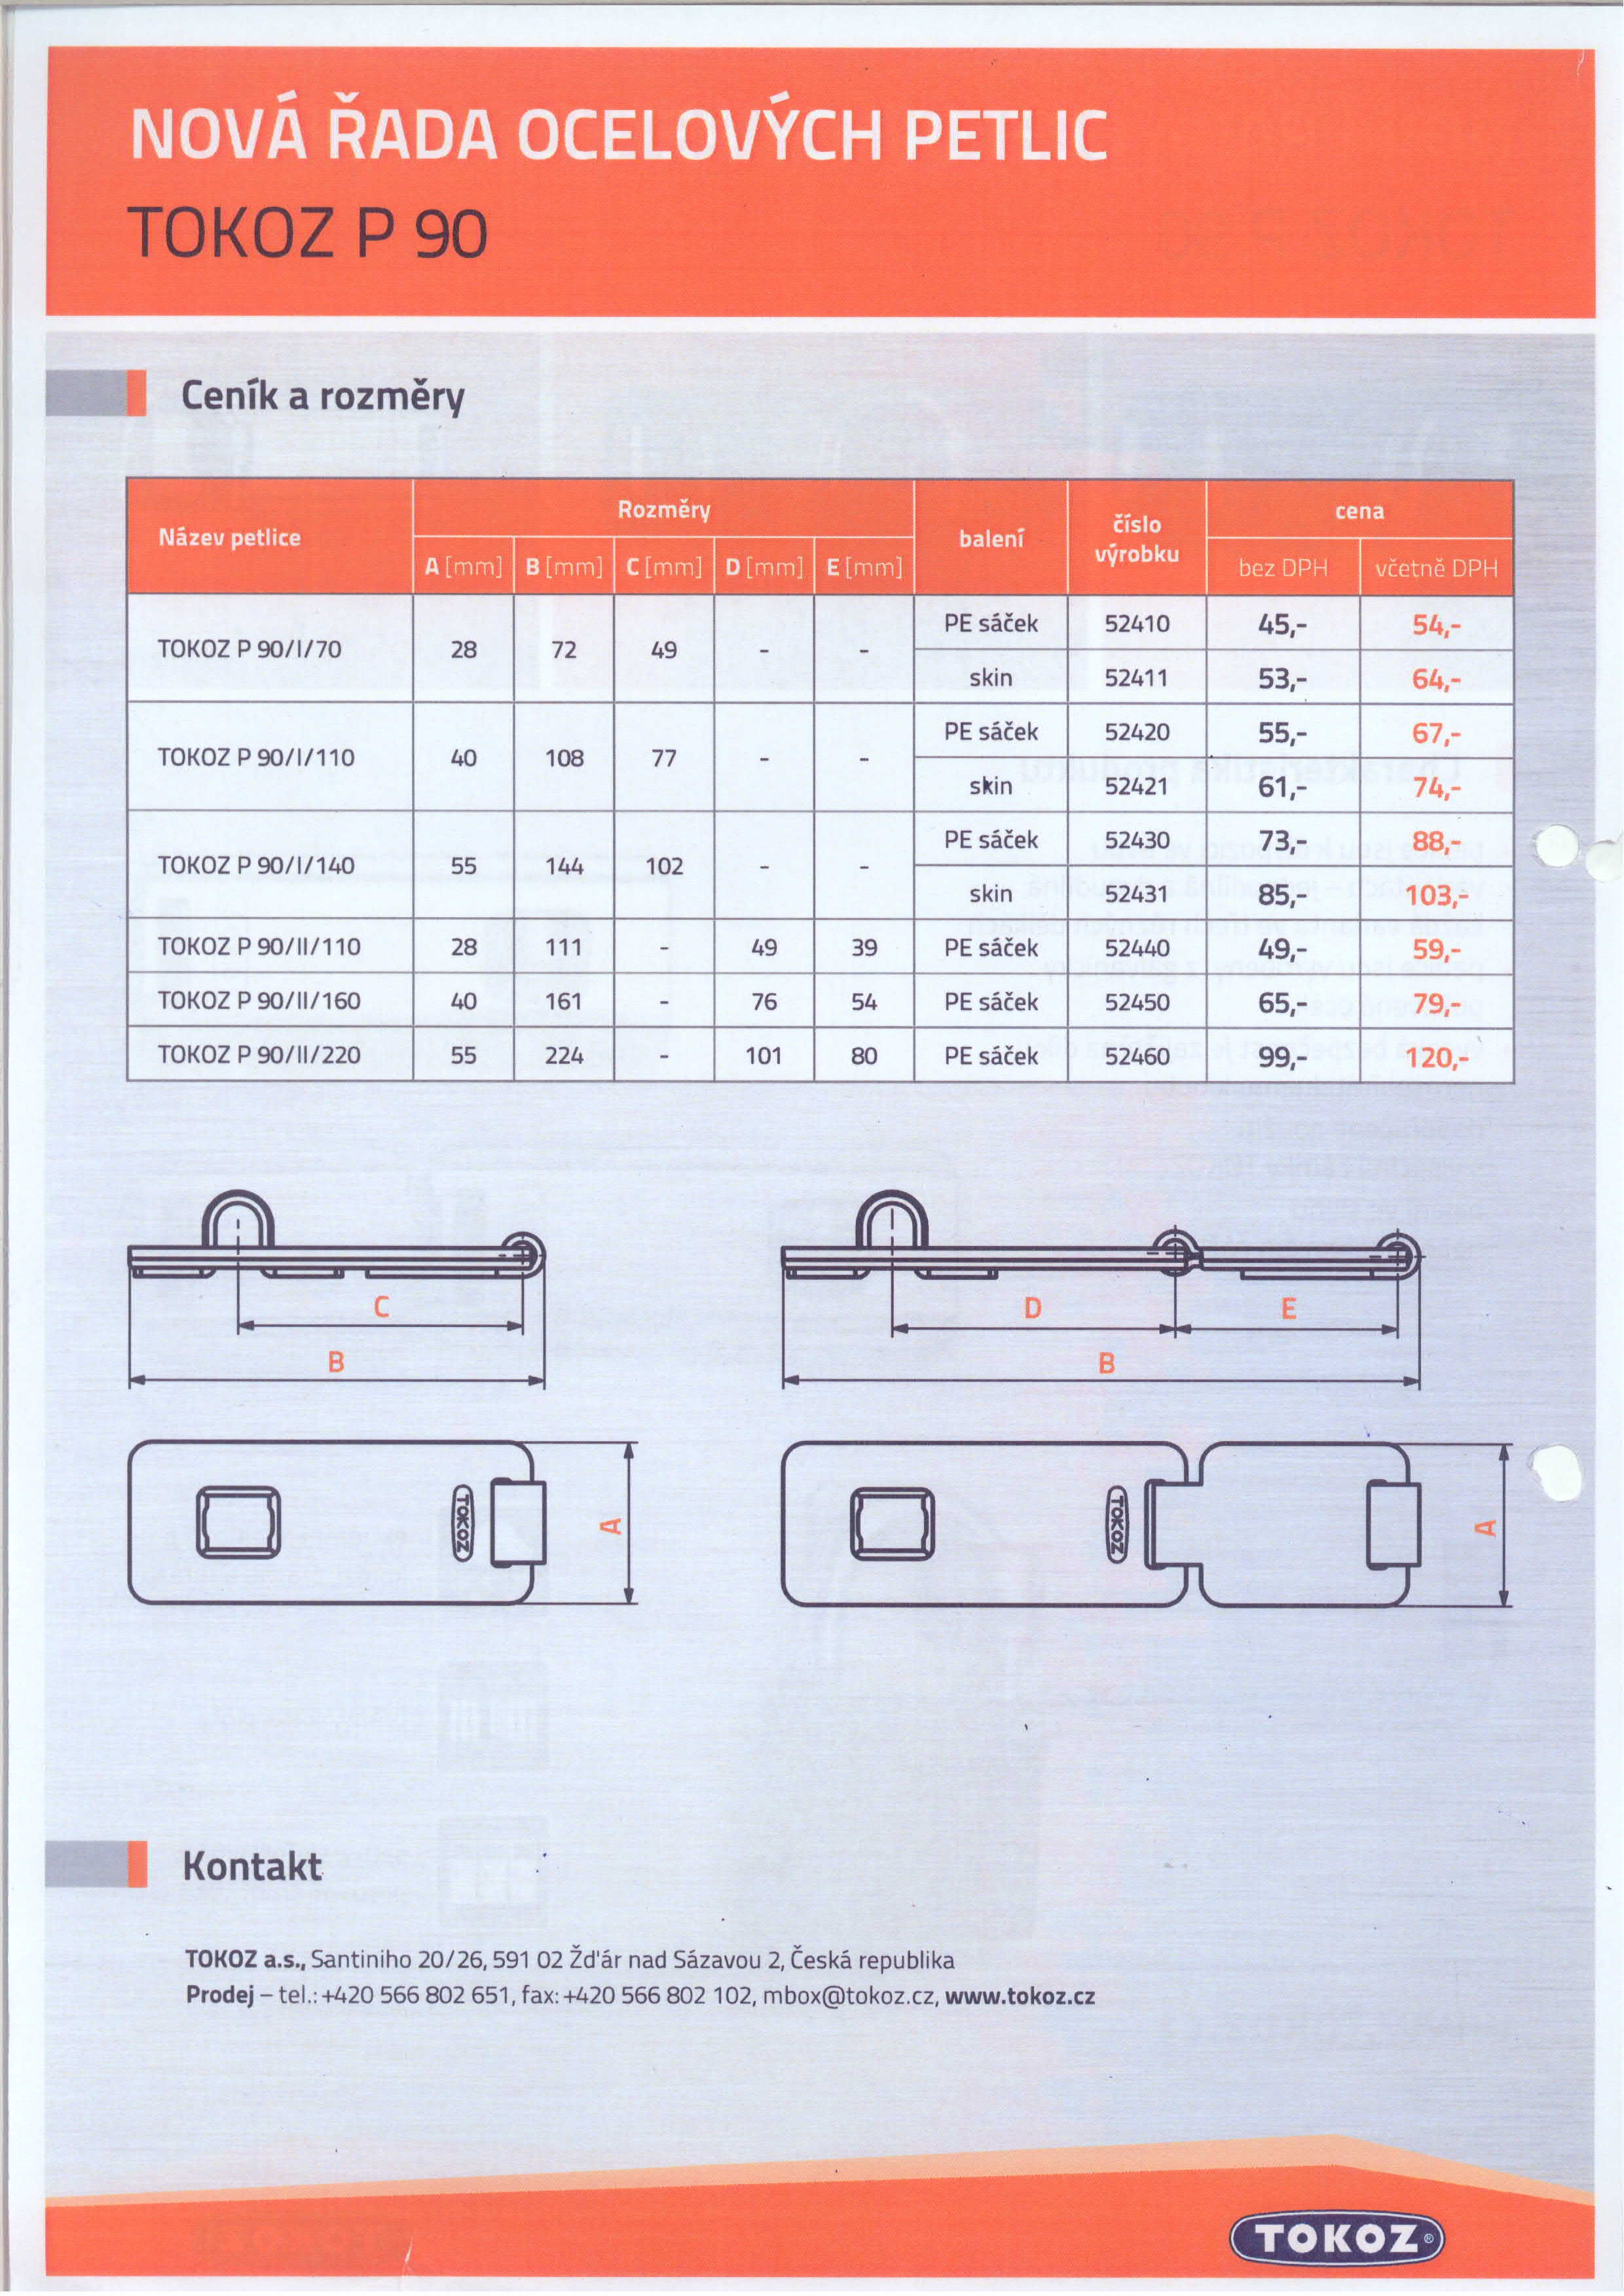 TOKOZ petlice 90 - katalog - rozměry